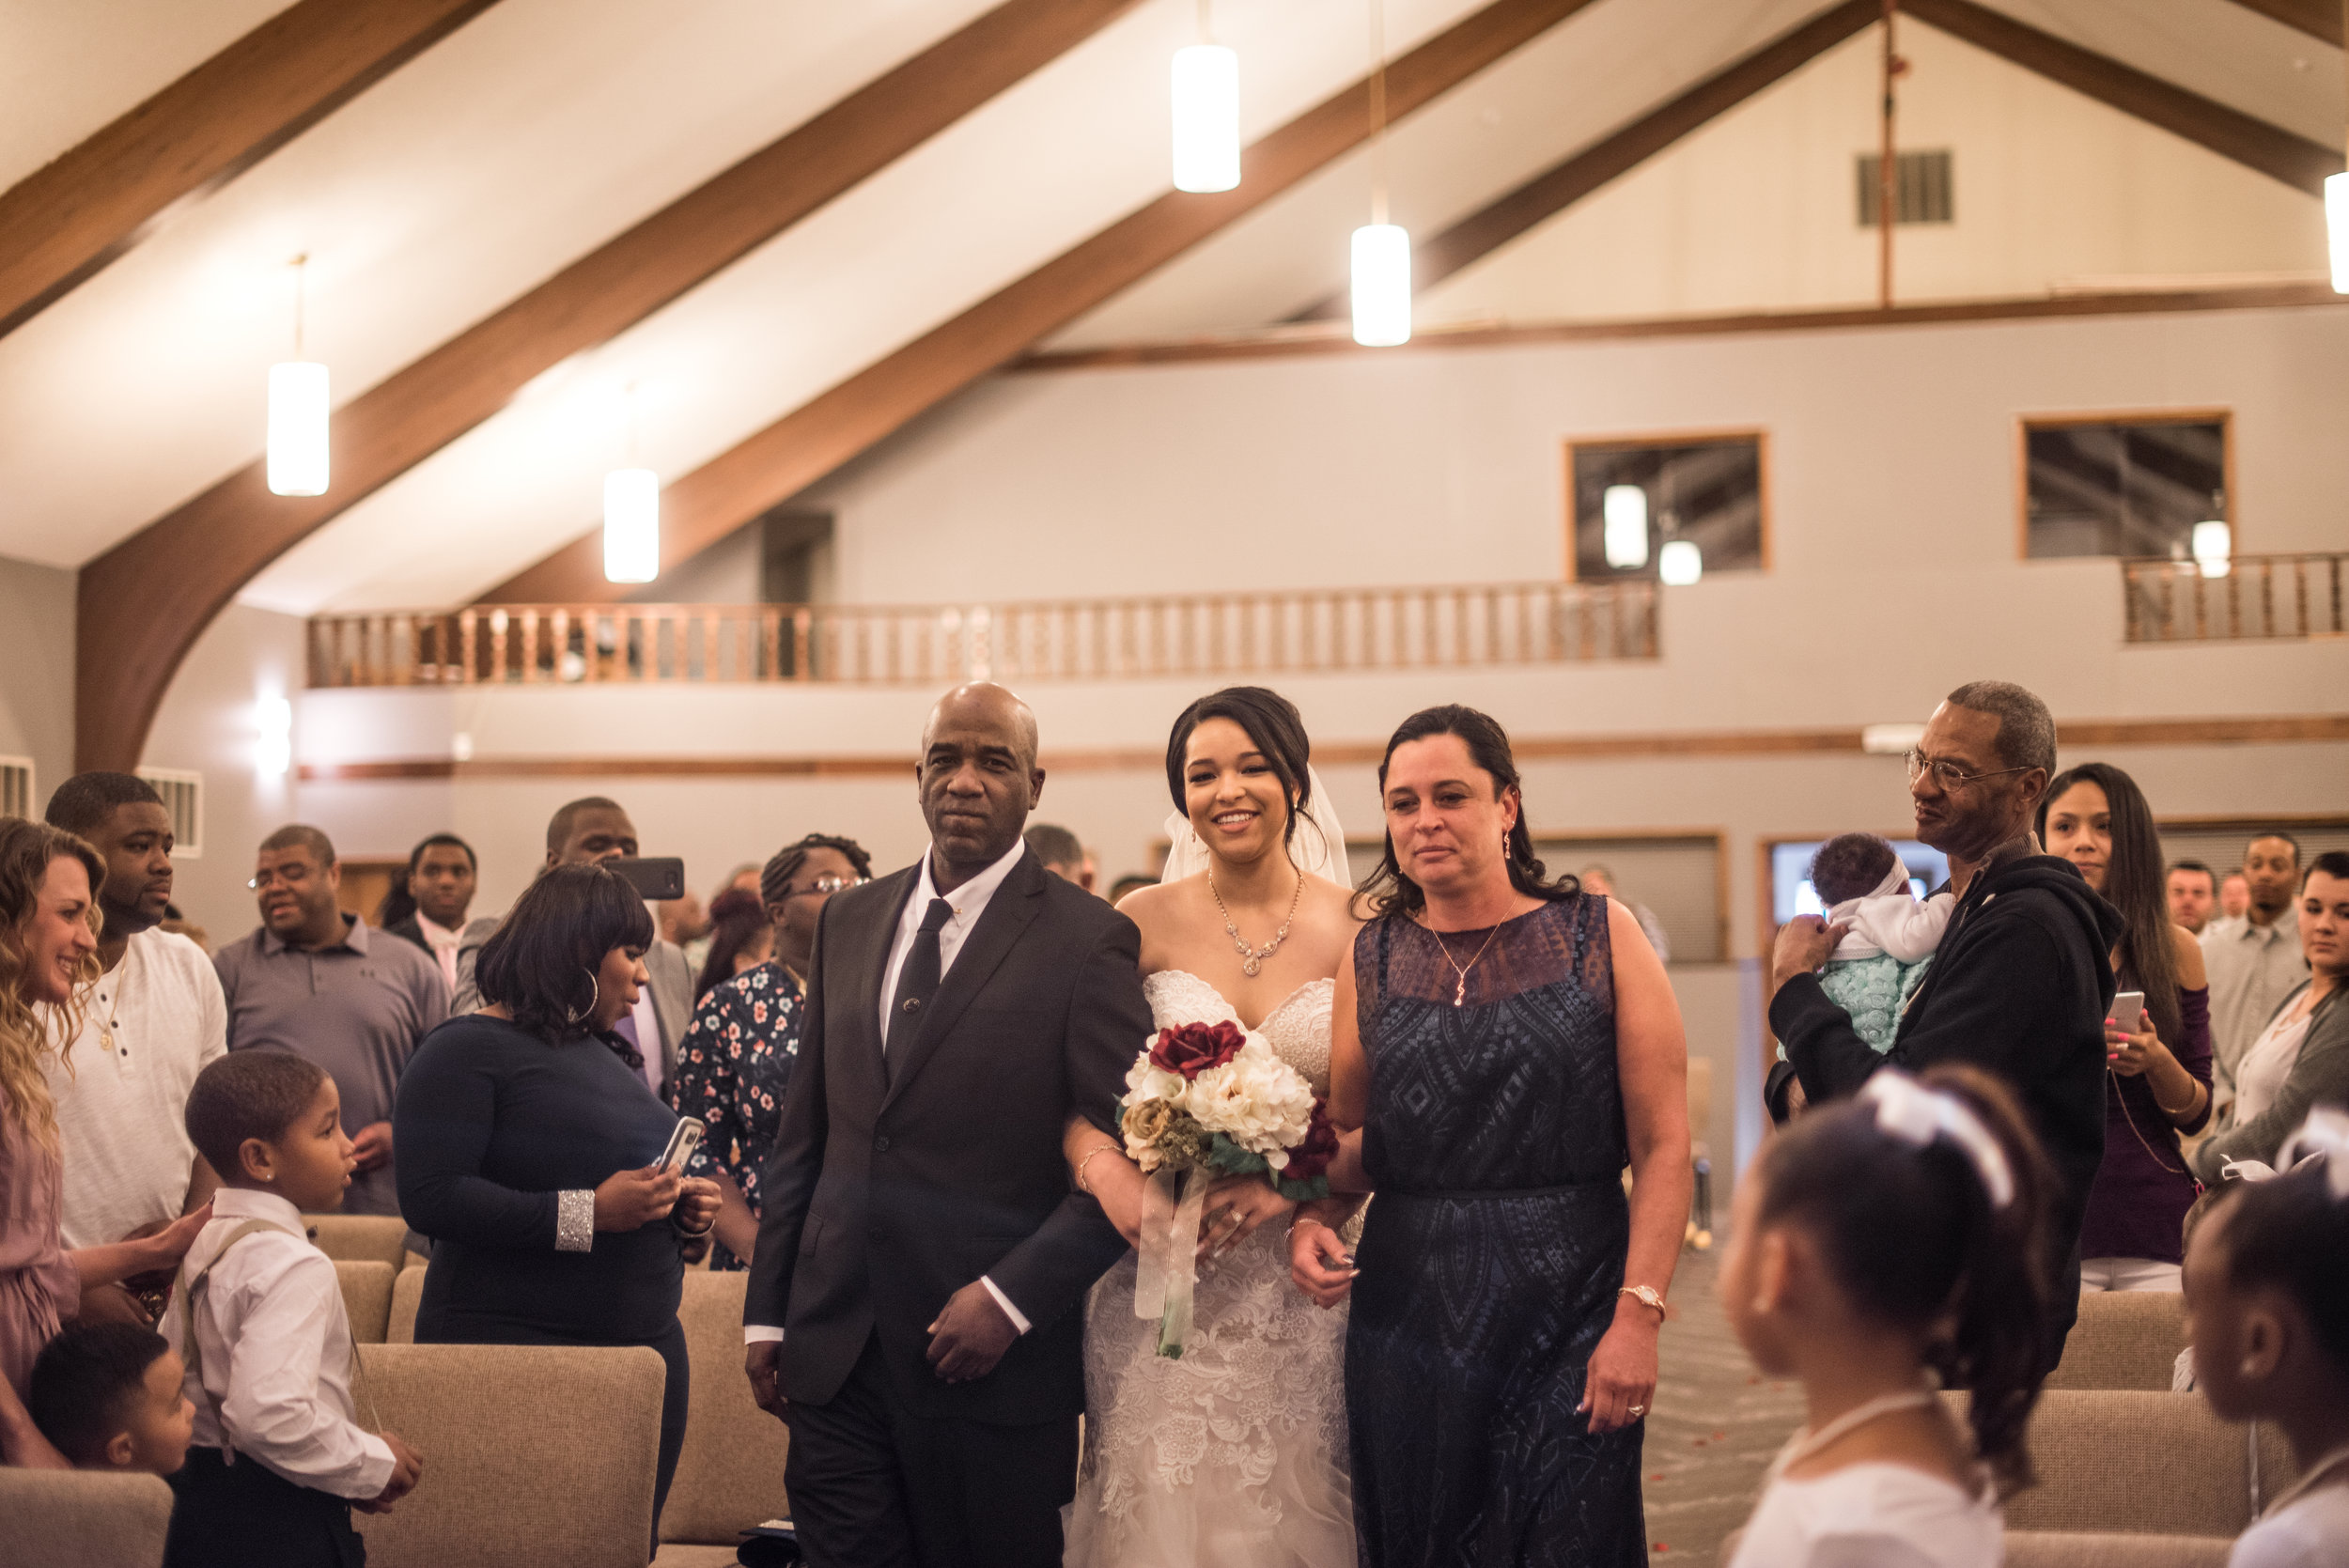 Burlington Iowa Wedding Midwest Photographer Melissa Cervantes _ Chantelle and Isaiah 321a.jpg